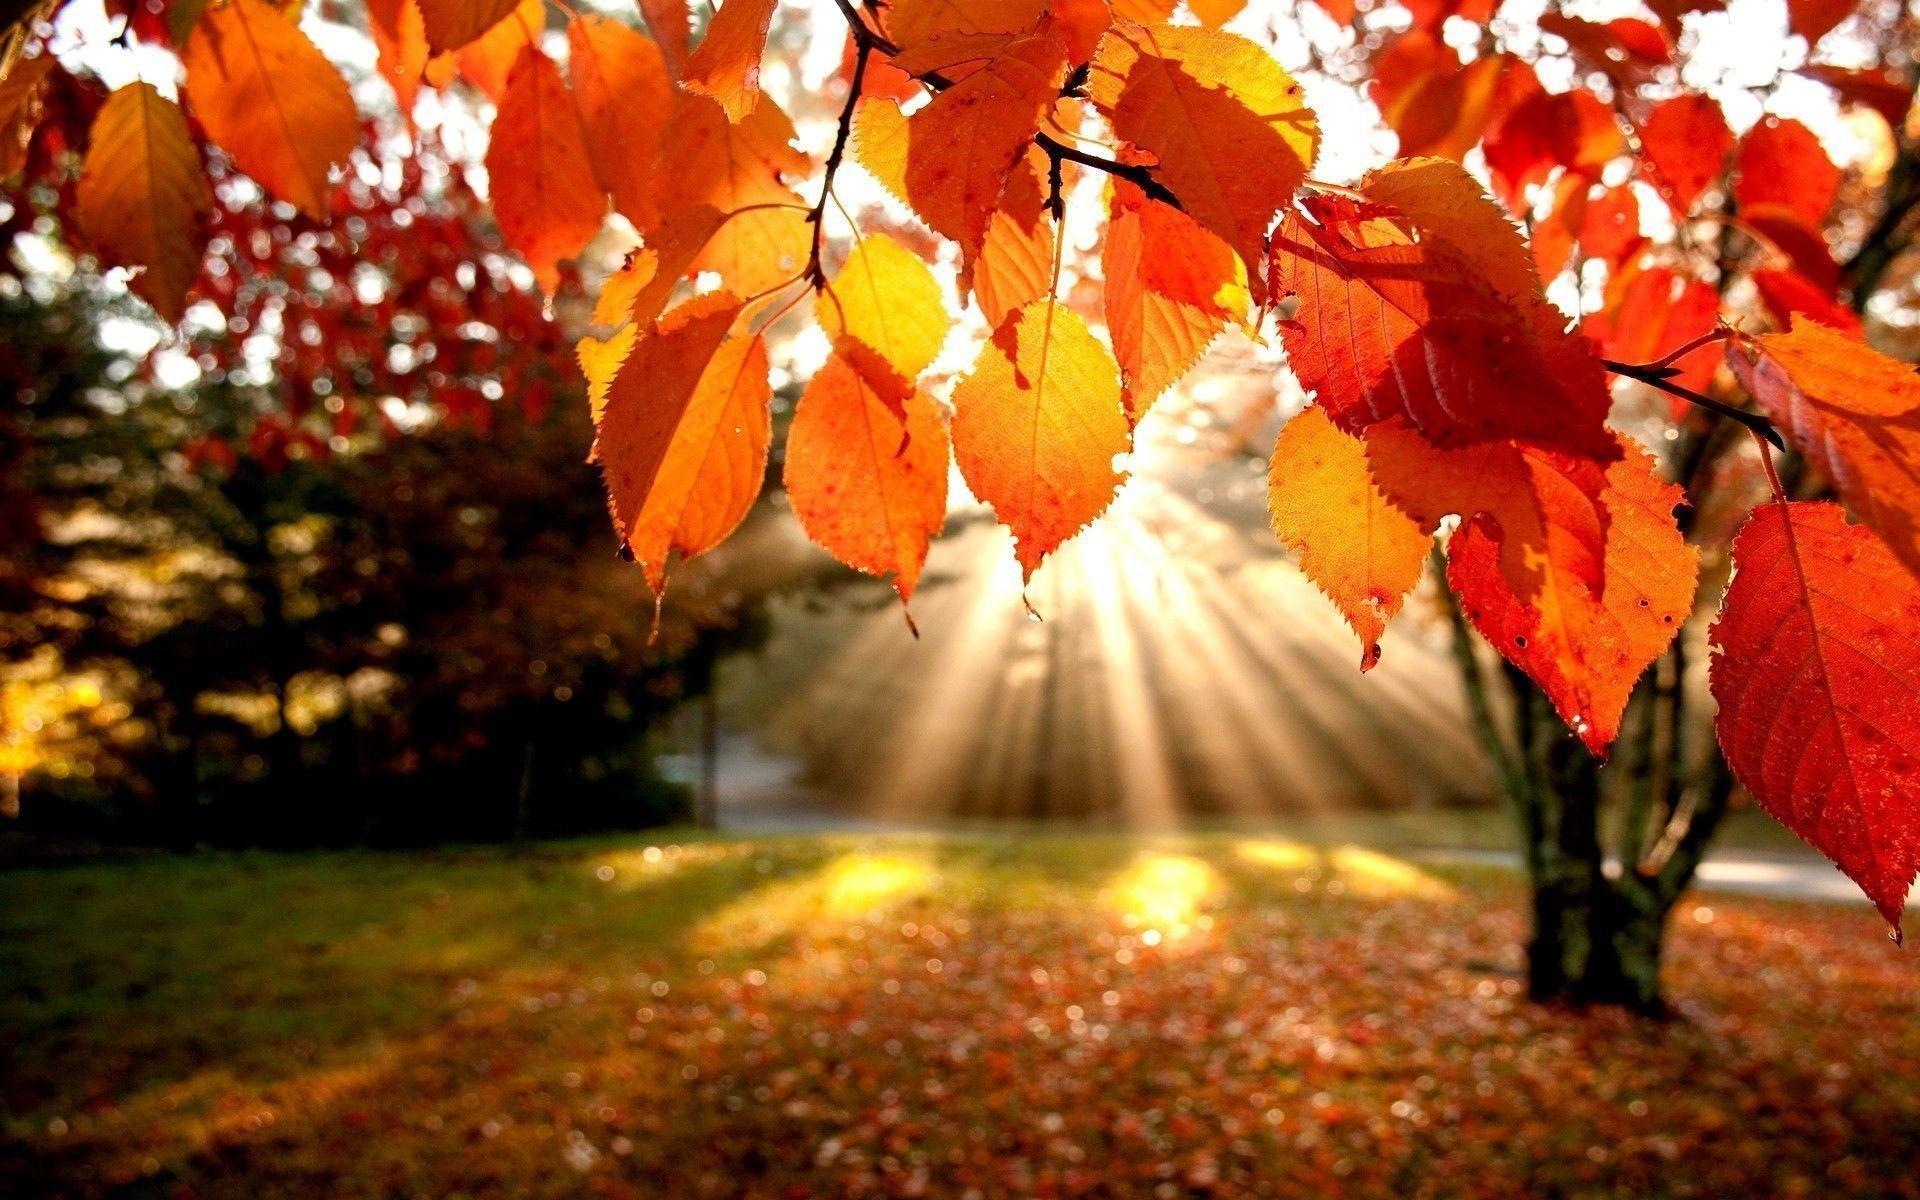 Fall Leaves Wallpaper Desktop 60 Pictures